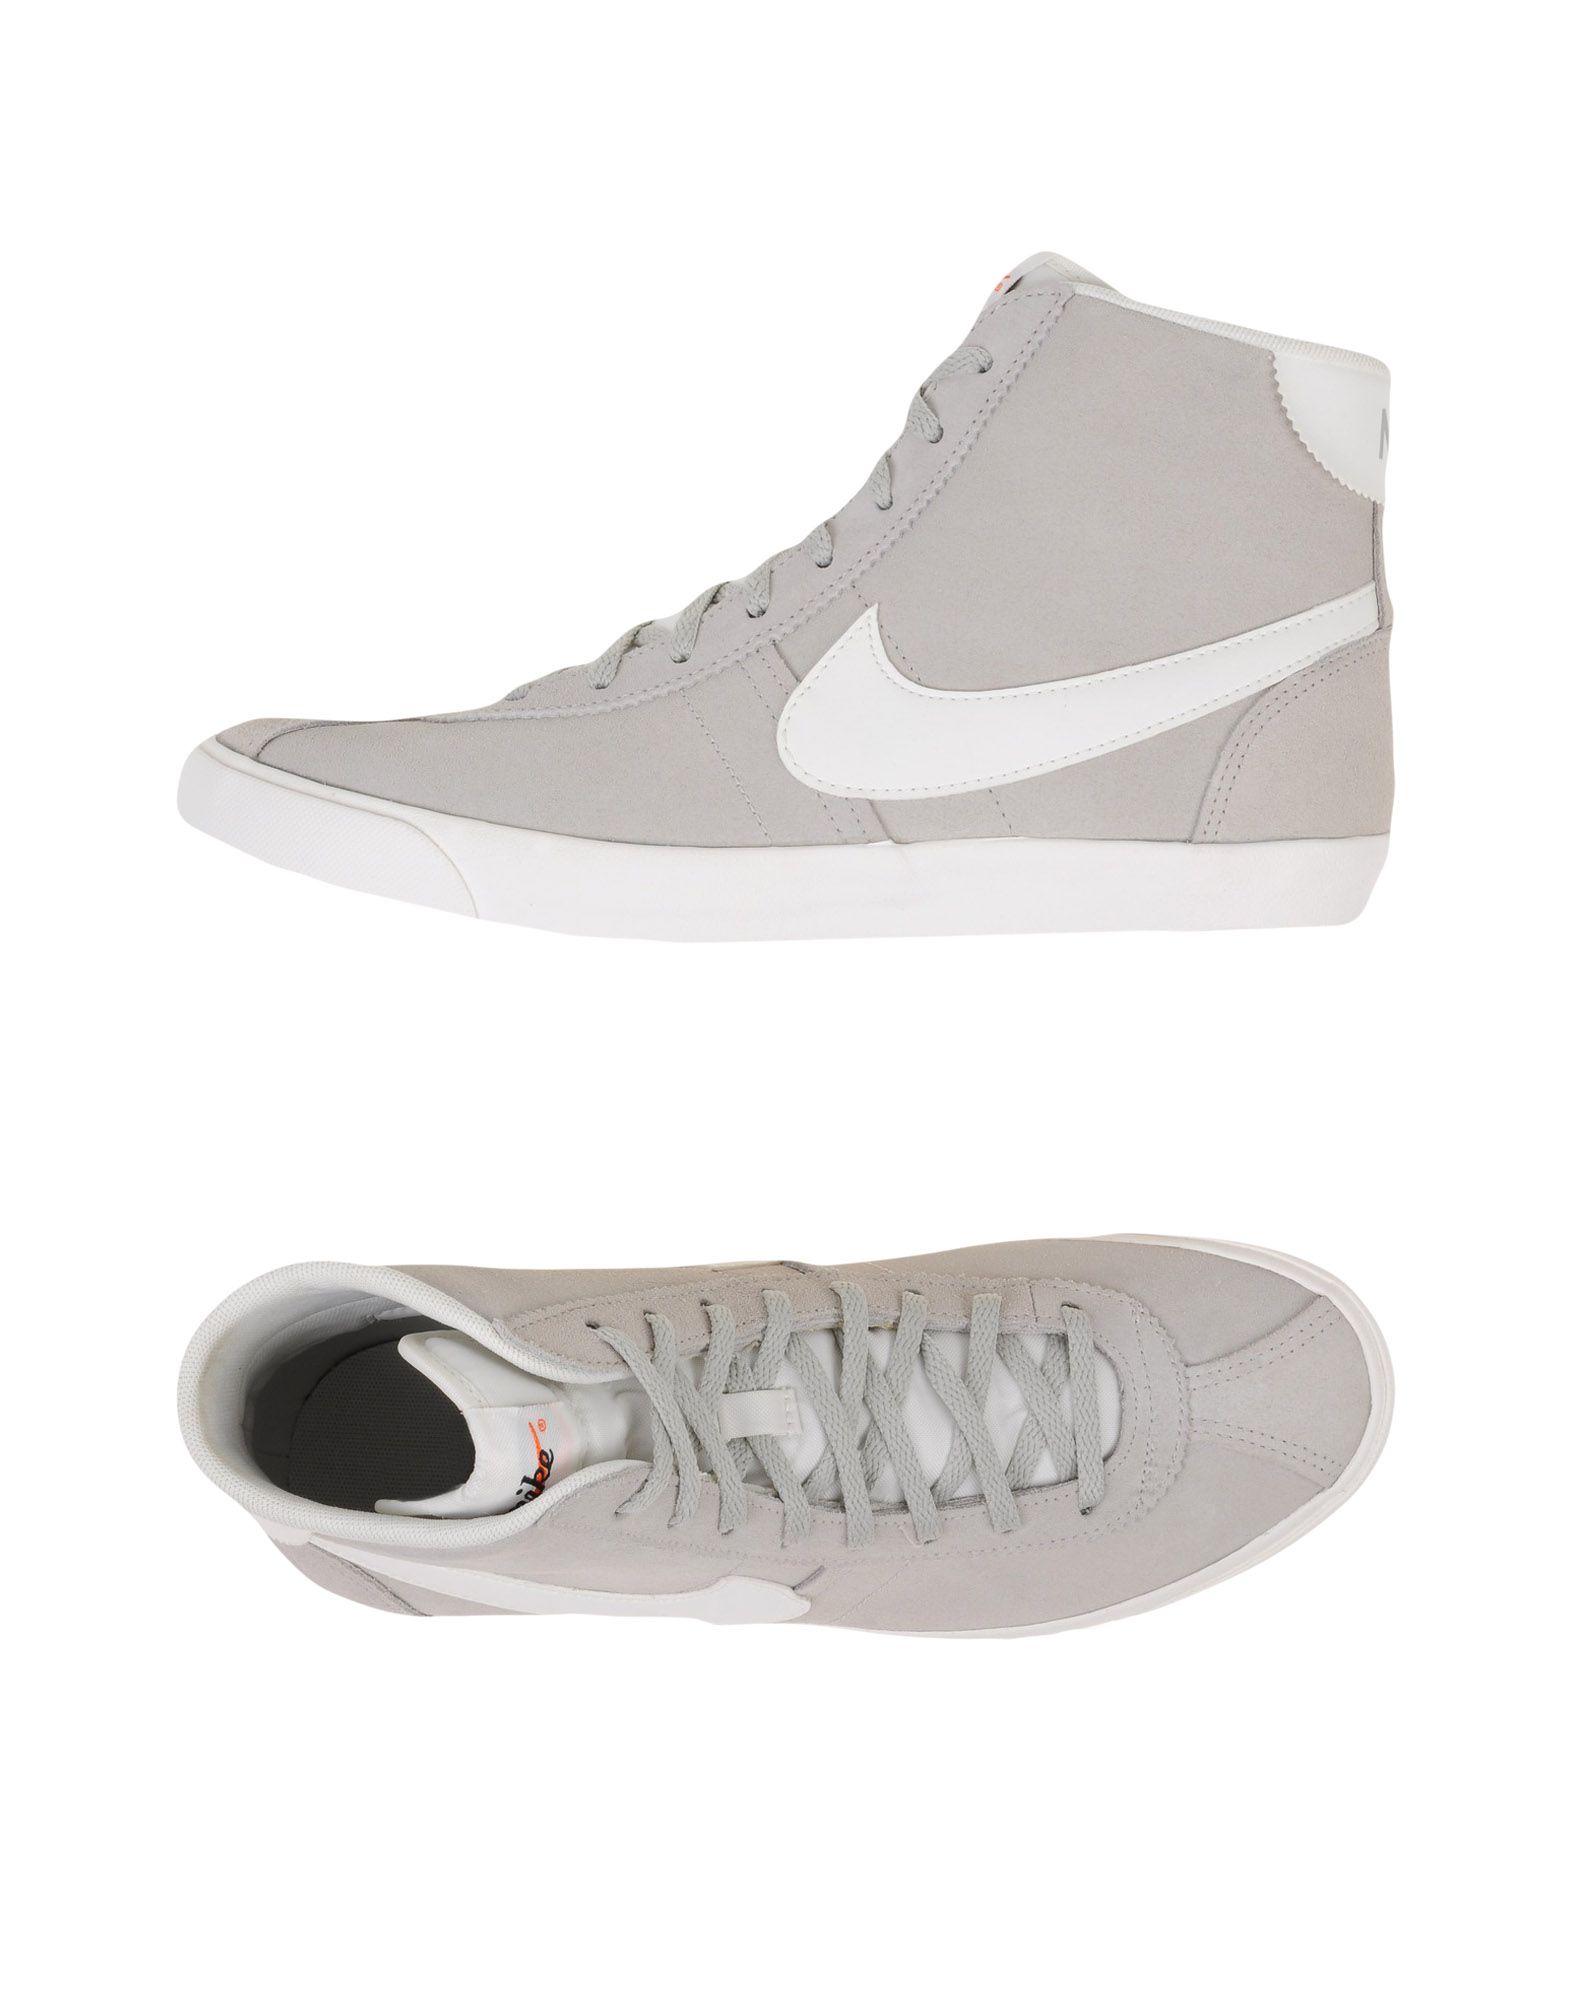 Nike Sneakers Damen Damen Sneakers  11132326BA Heiße Schuhe 7accf5